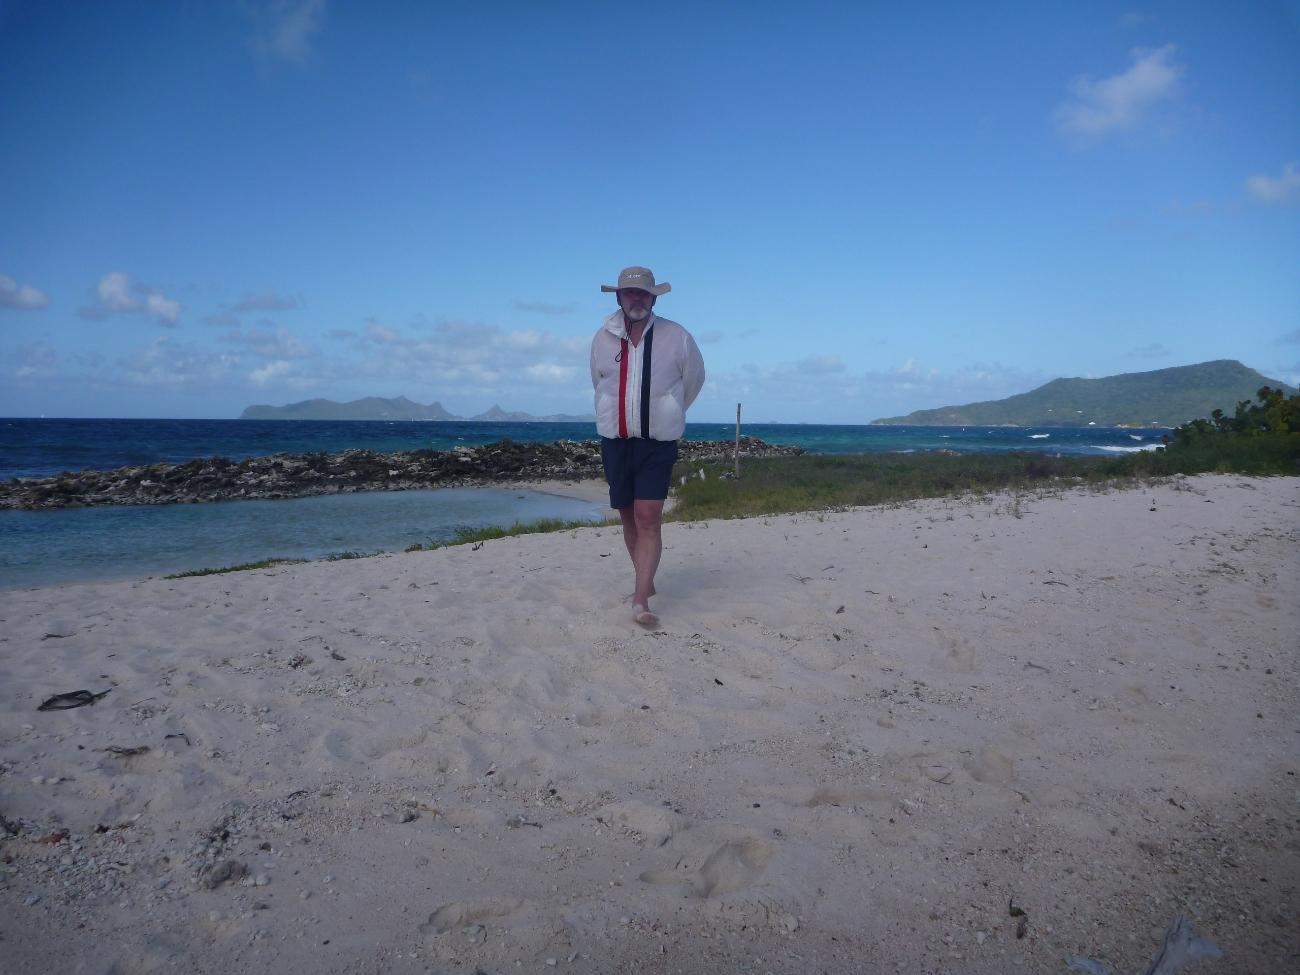 Børre på beach vandring på Sandy Island